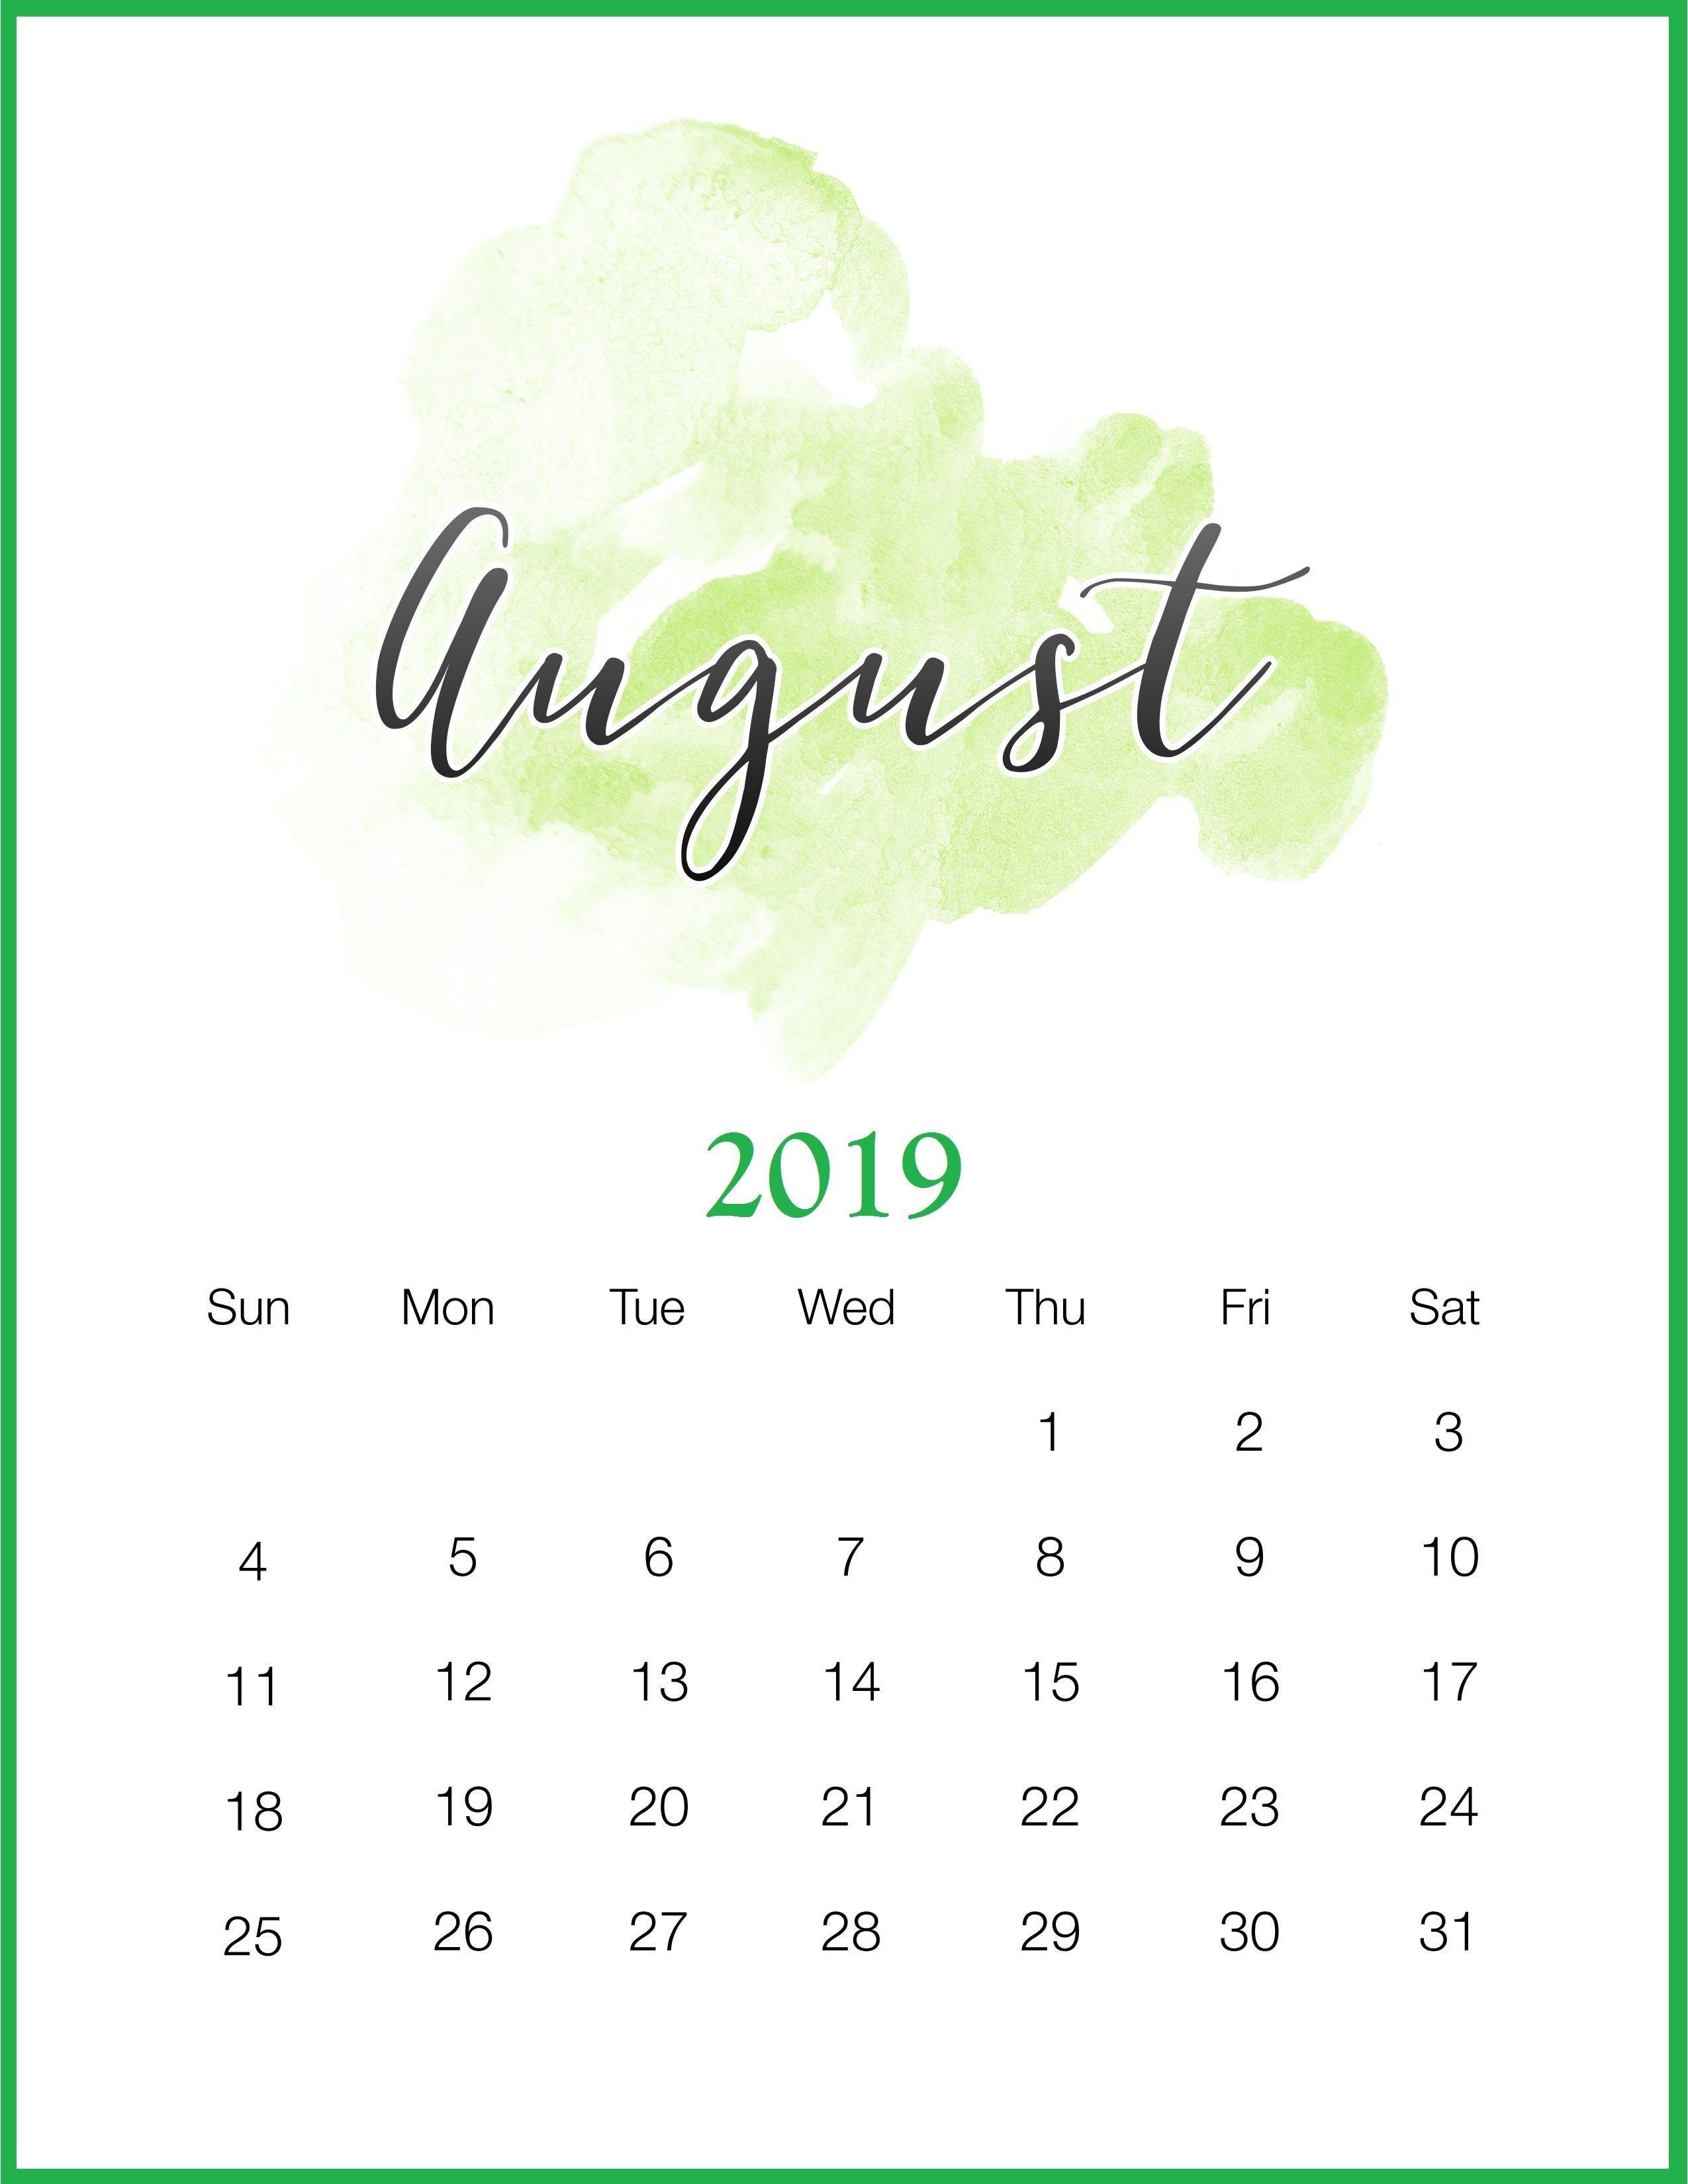 Watercolor August 2019 Calendar #august #august2019 #2019Calendar August 9 2019 Calendar